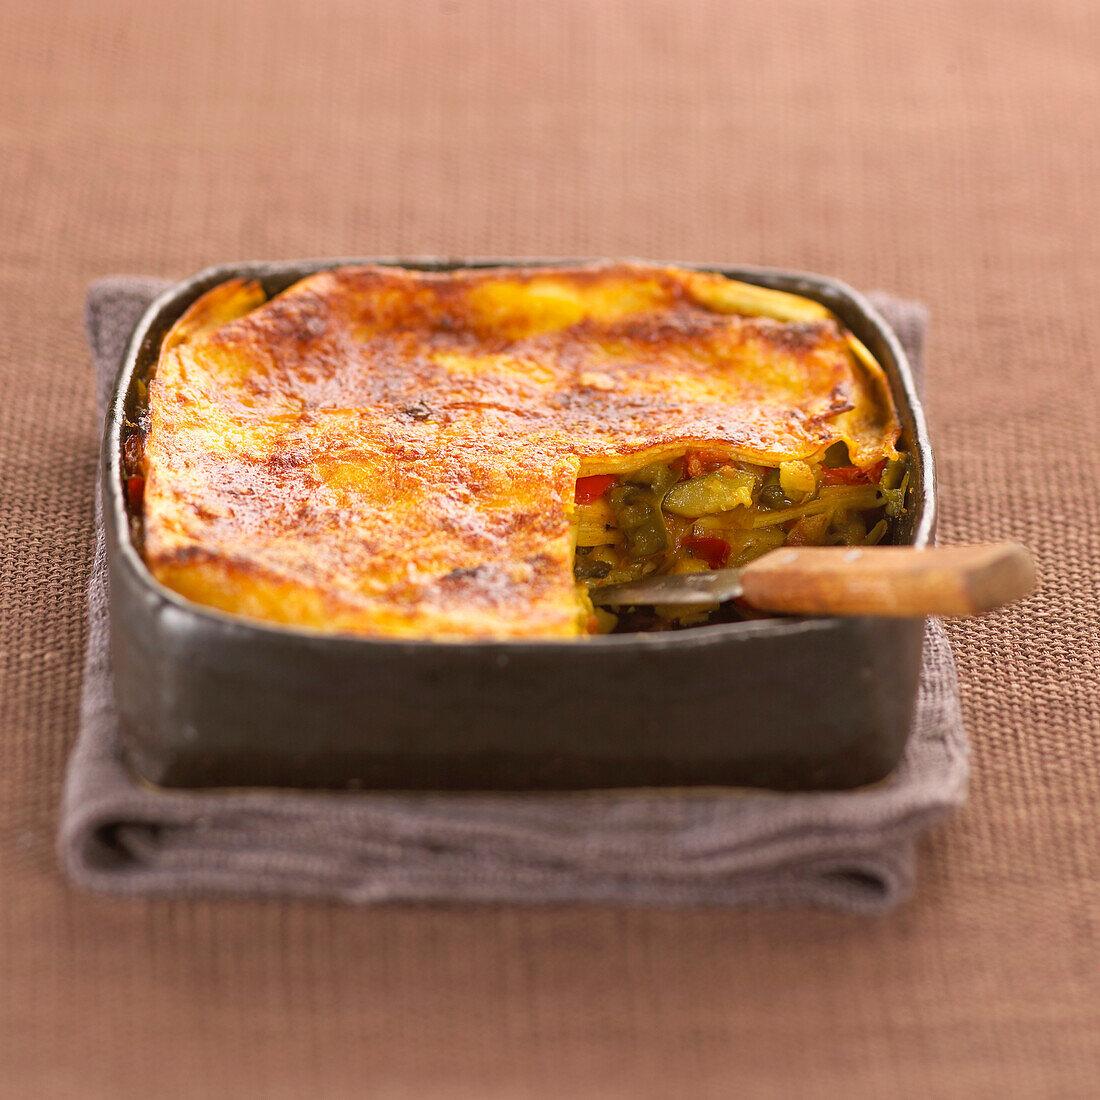 vegetable lasagna bake (topic: bakes)